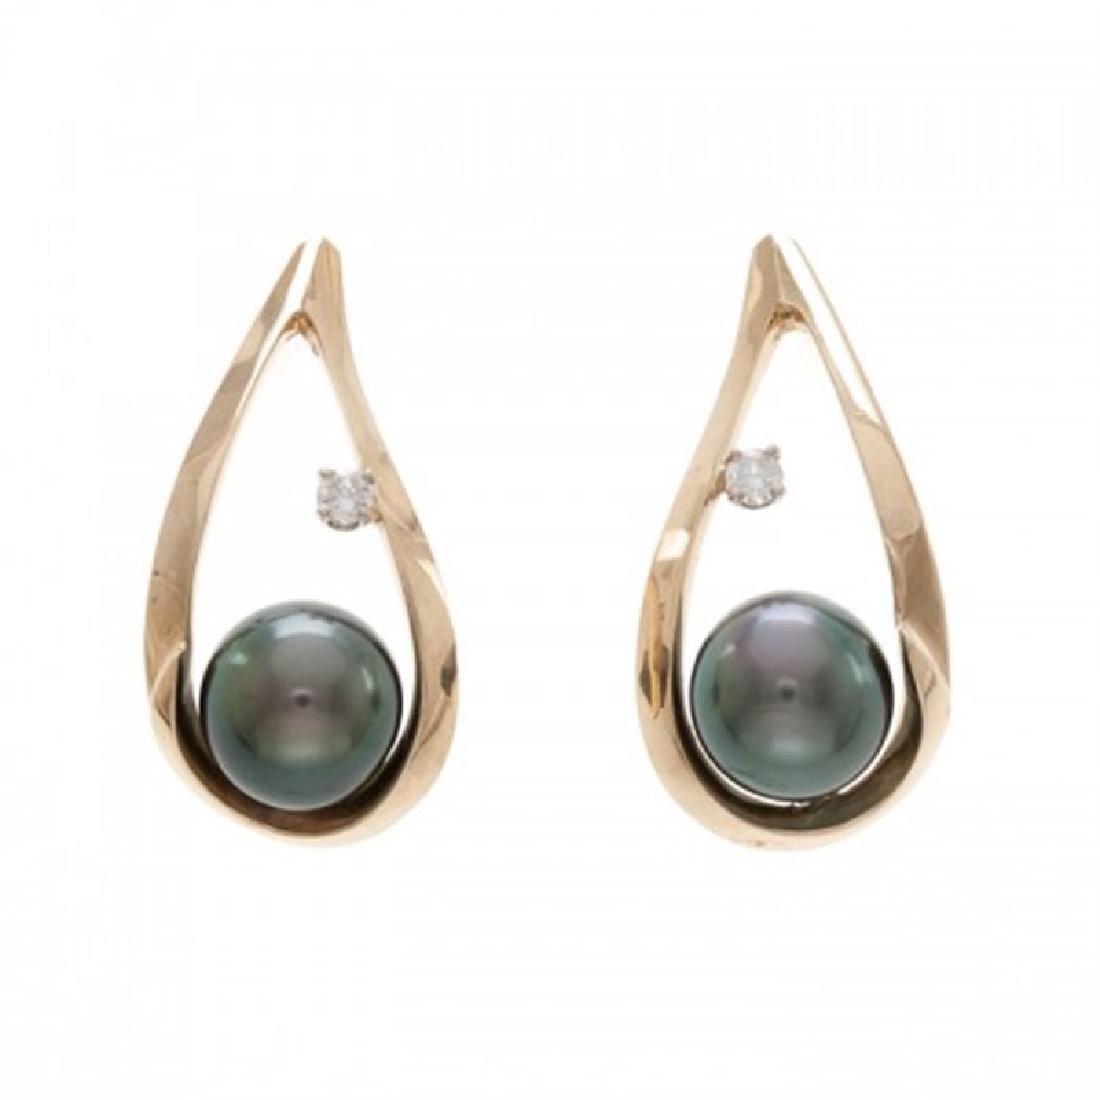 7.5-8.0mm Tahitian Black Earrings with Diamonds